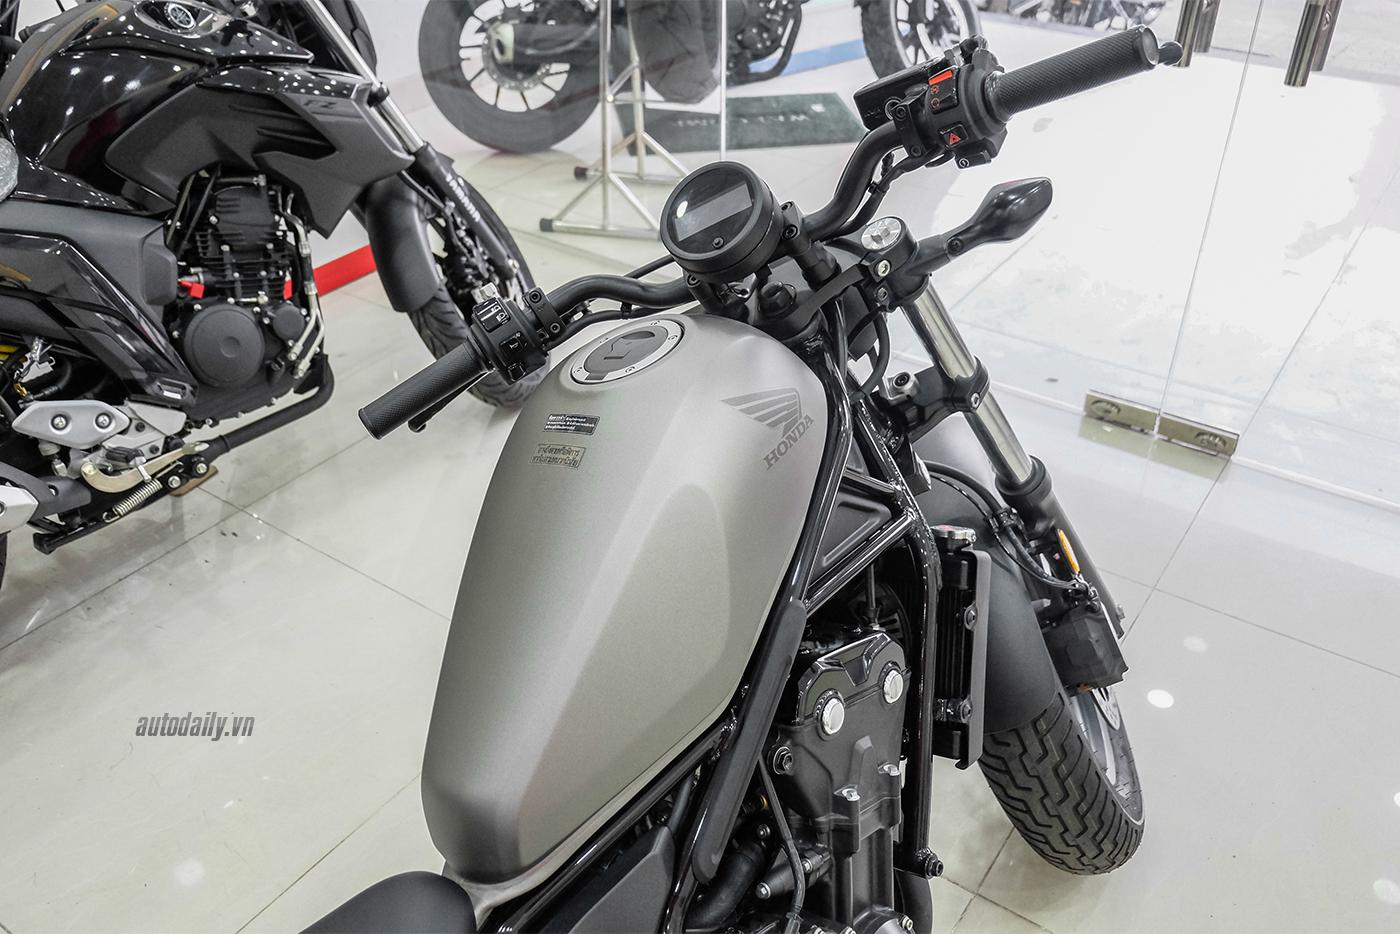 honda-rebel-500-abs-2017-11.jpg